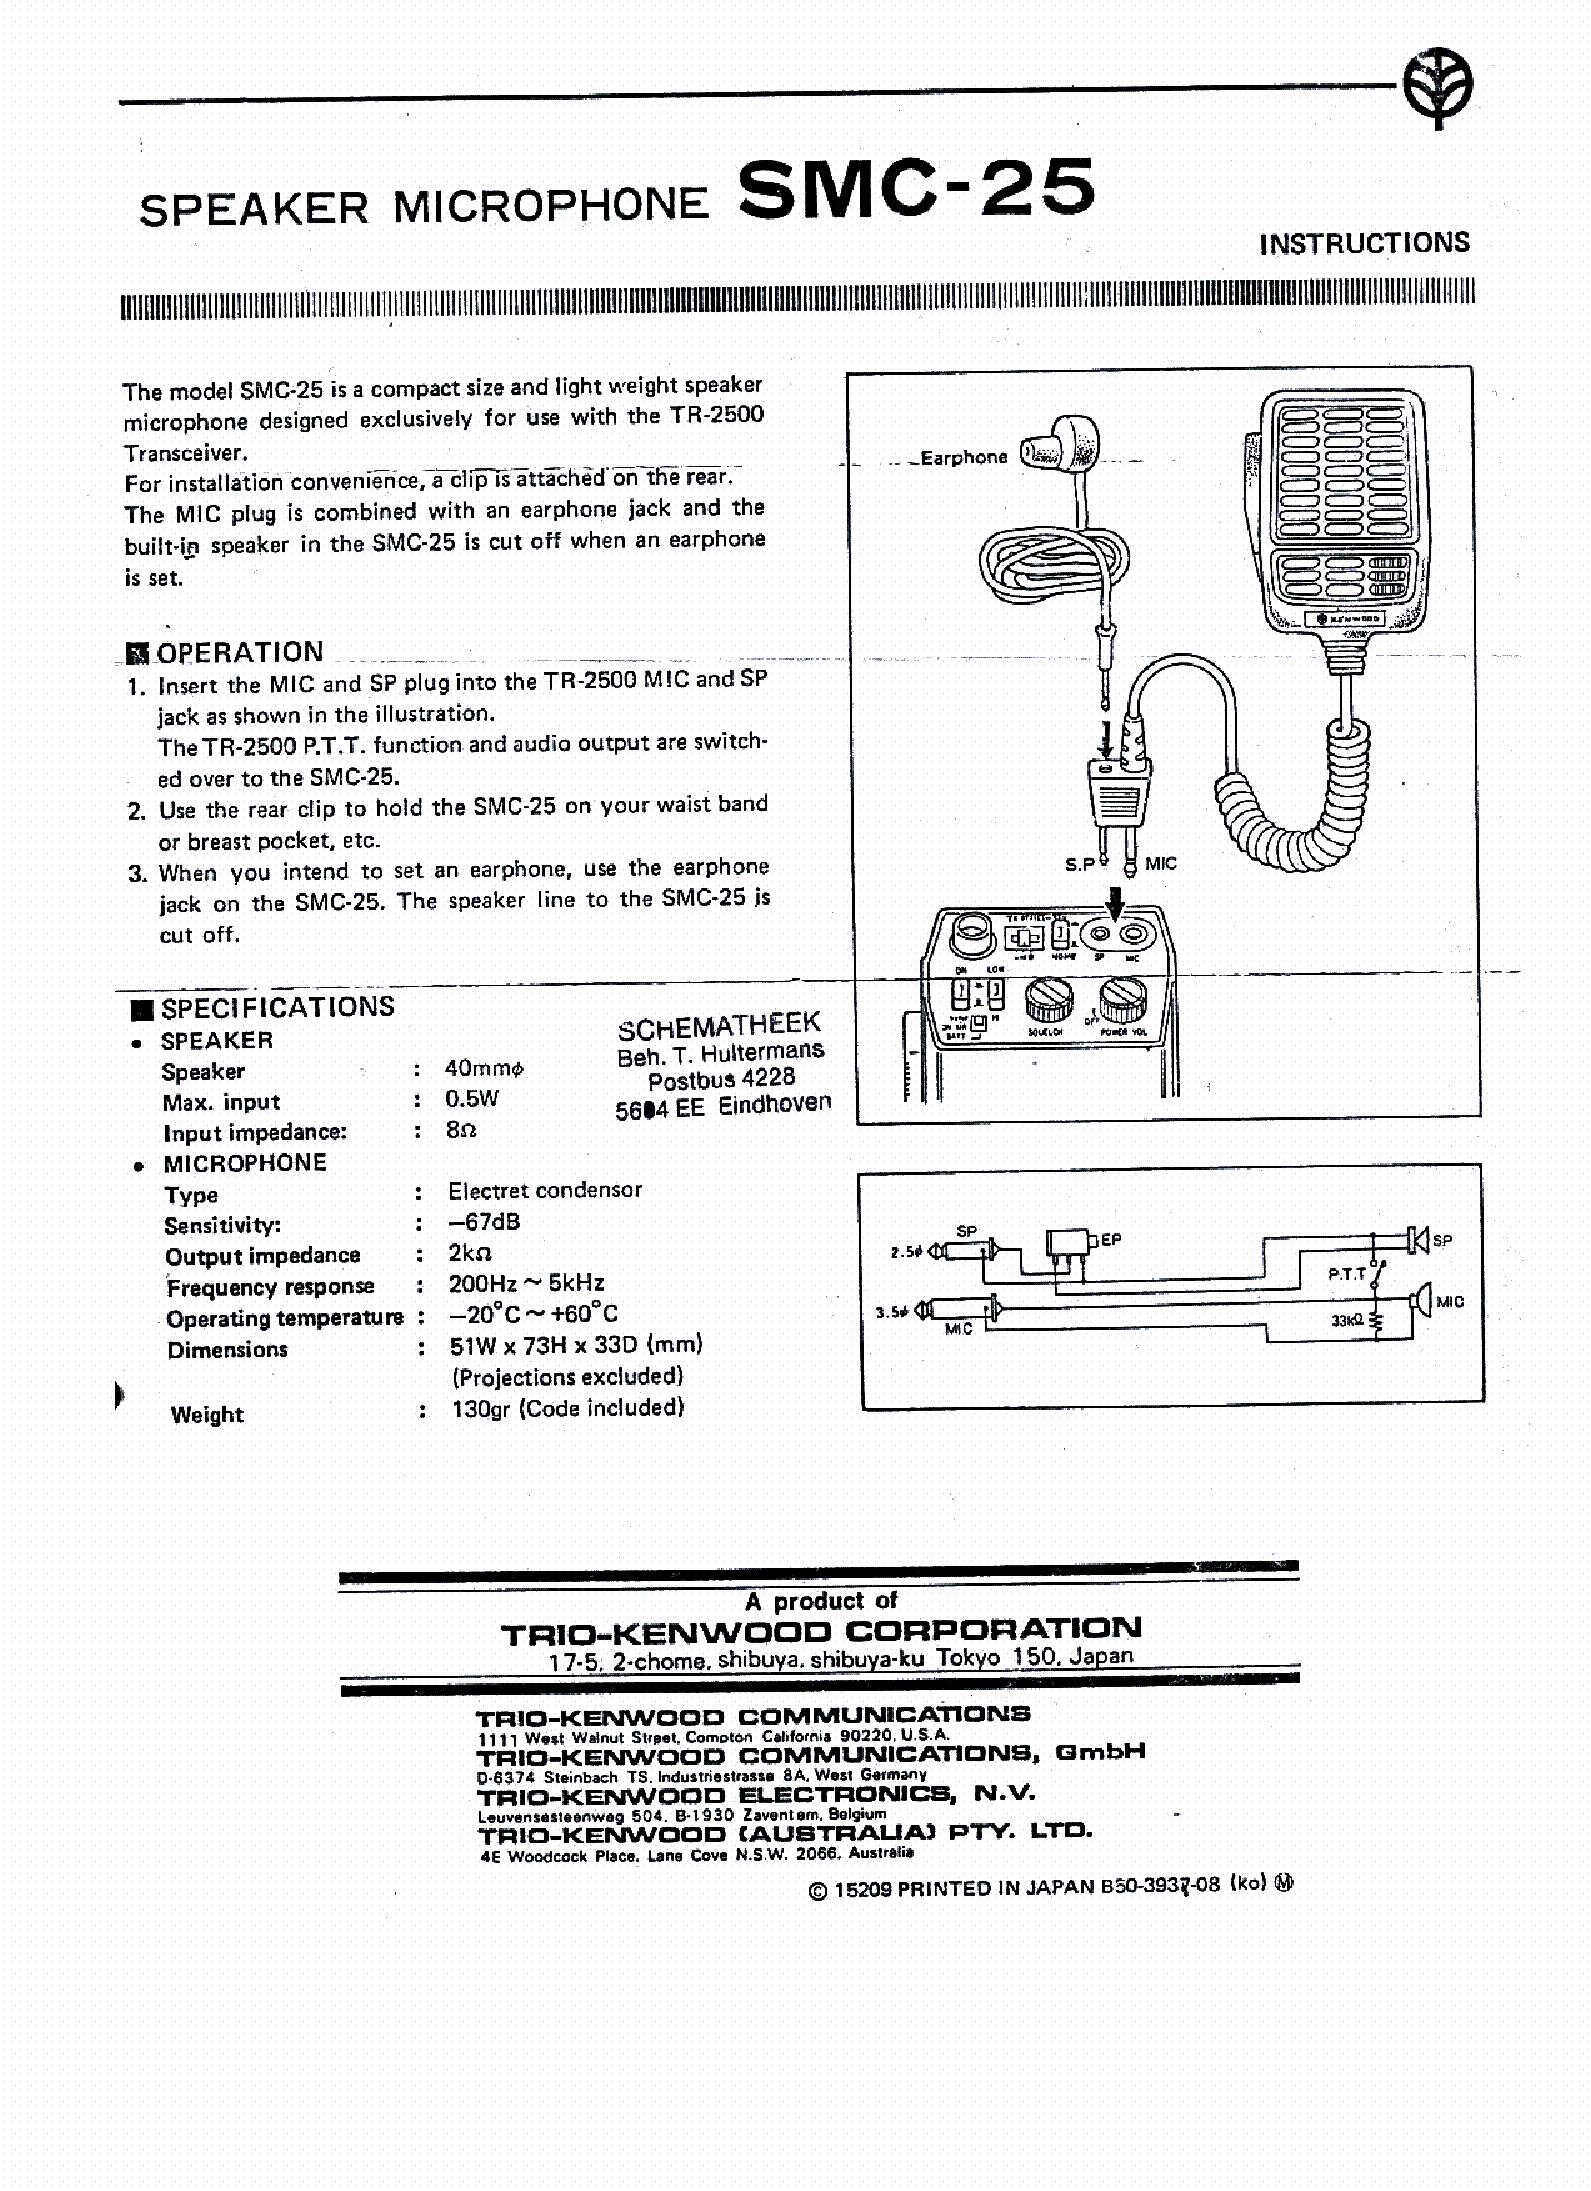 KENWOOD SMC-25 SCH service manual (1st page)